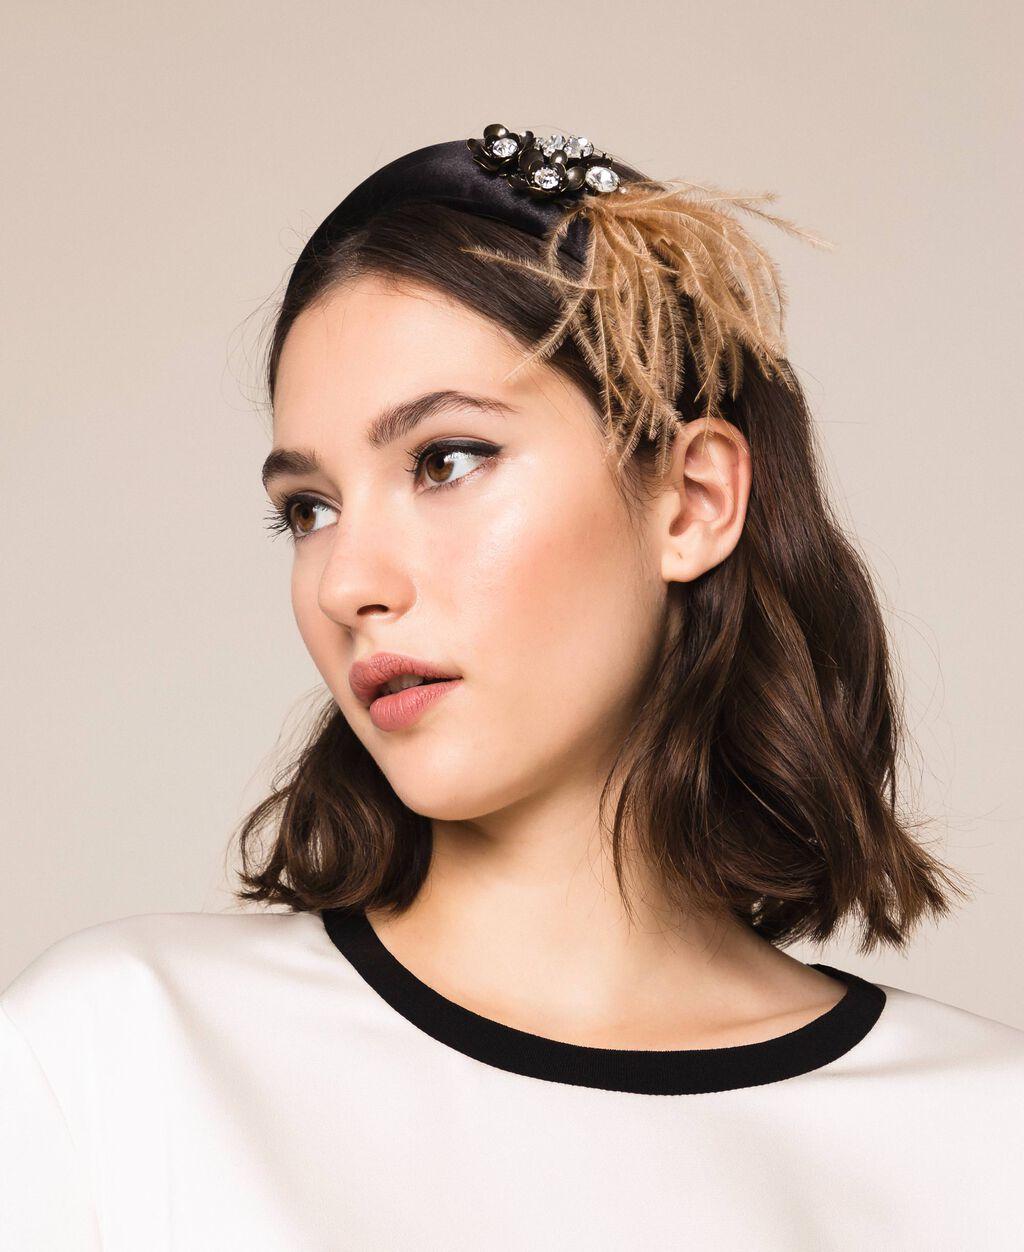 Satin headband with bezels, feathers and rhinestones